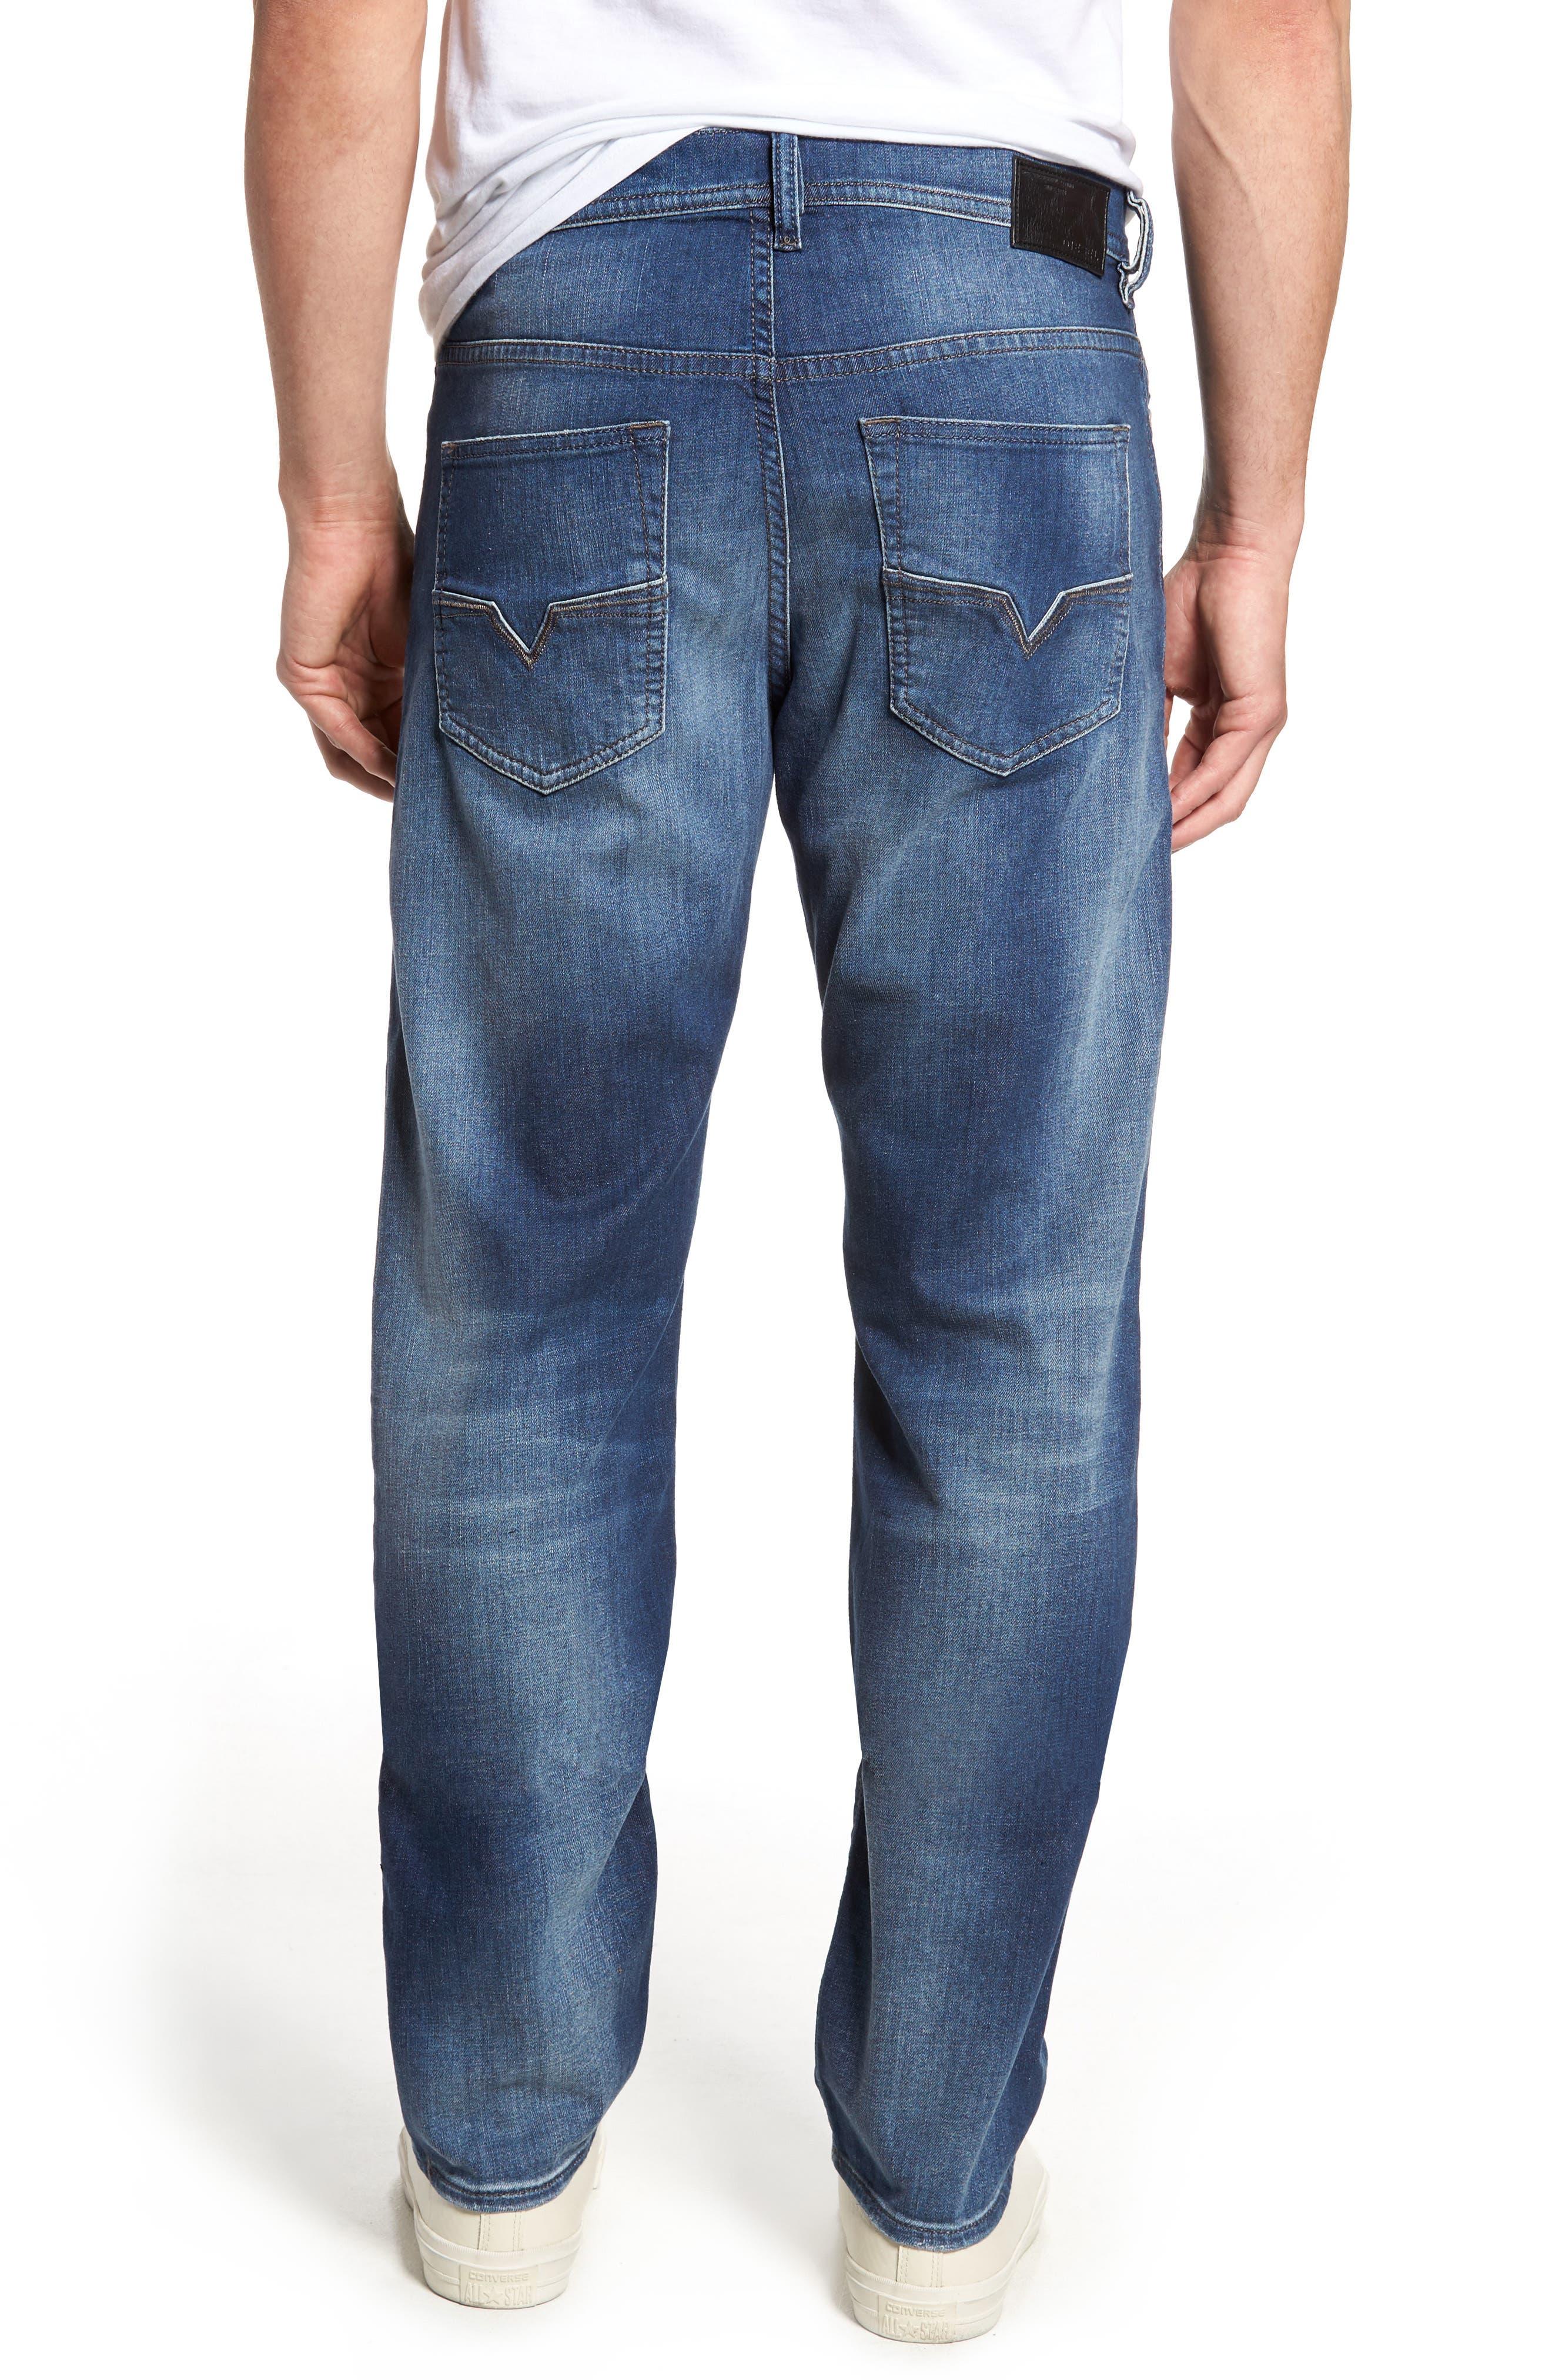 Thytan Straight Leg Jeans,                             Alternate thumbnail 2, color,                             400